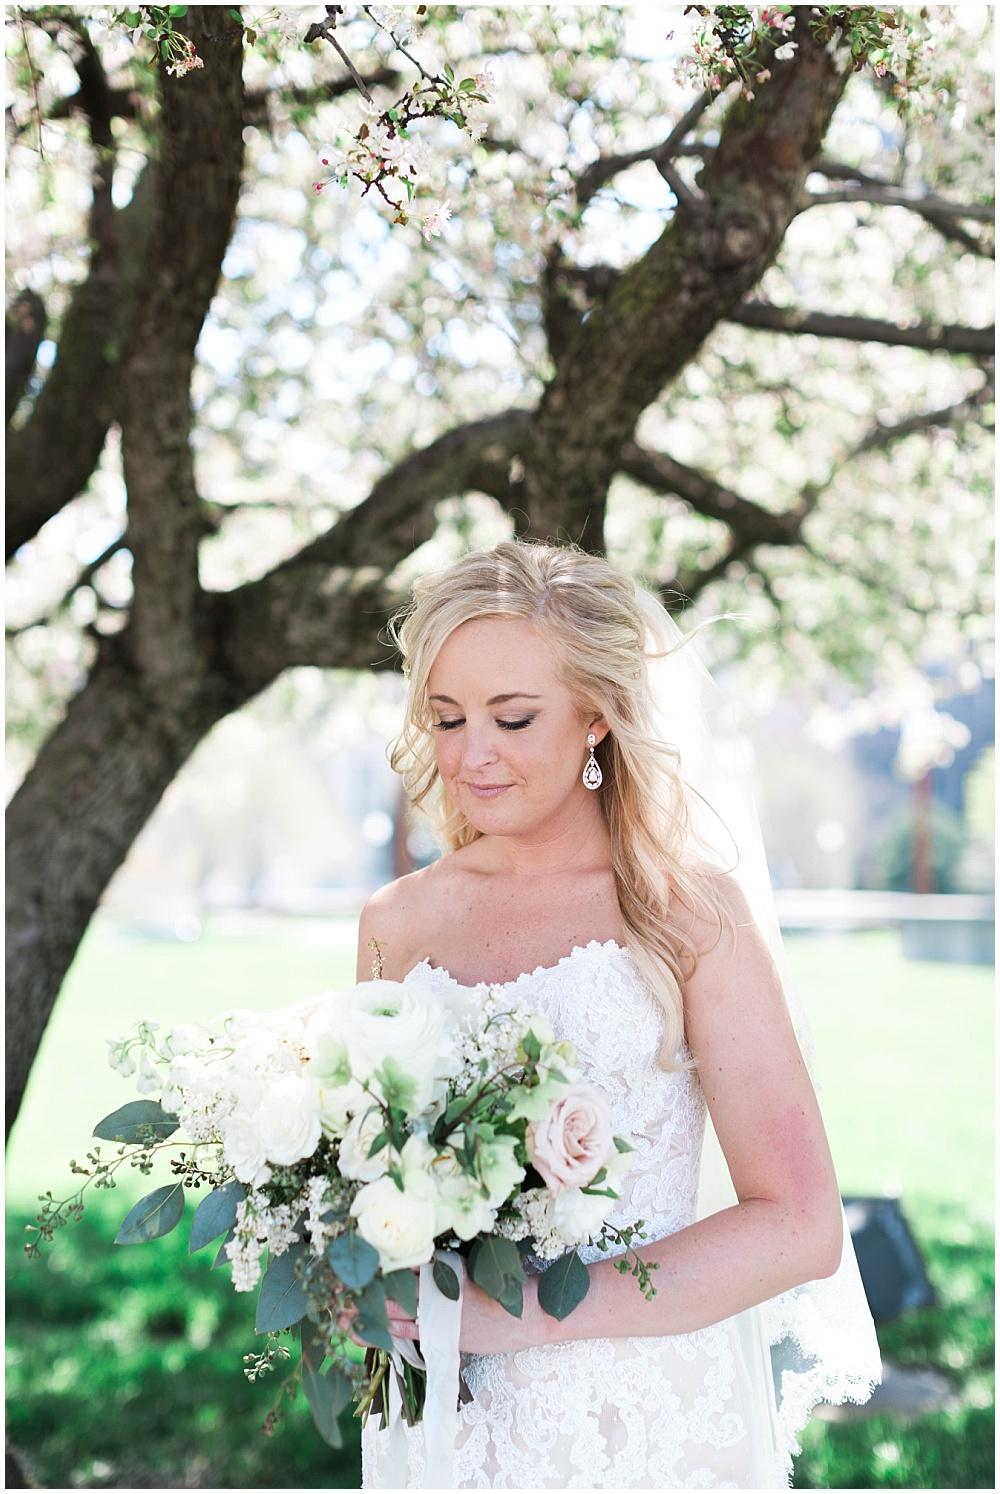 Downtown Indianapolis, Indiana Wedding | Melanie + Chris - Jessica ...